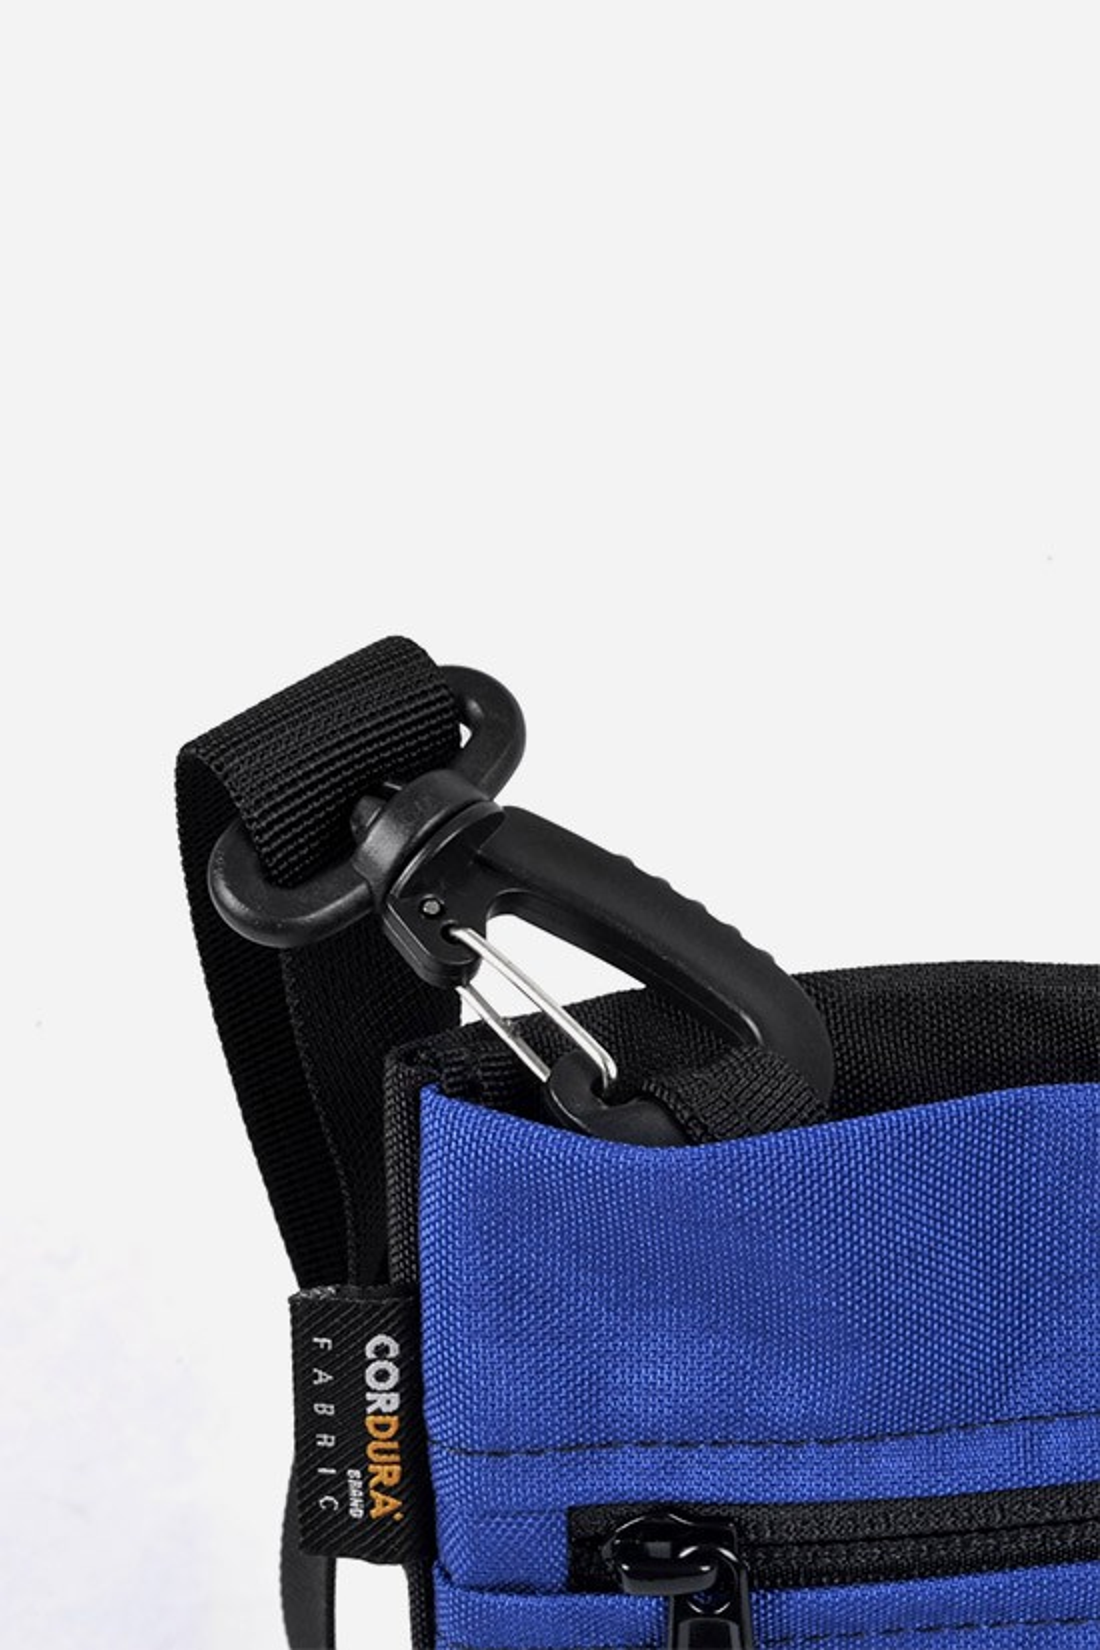 RAVE / Slim bag Indigo/black